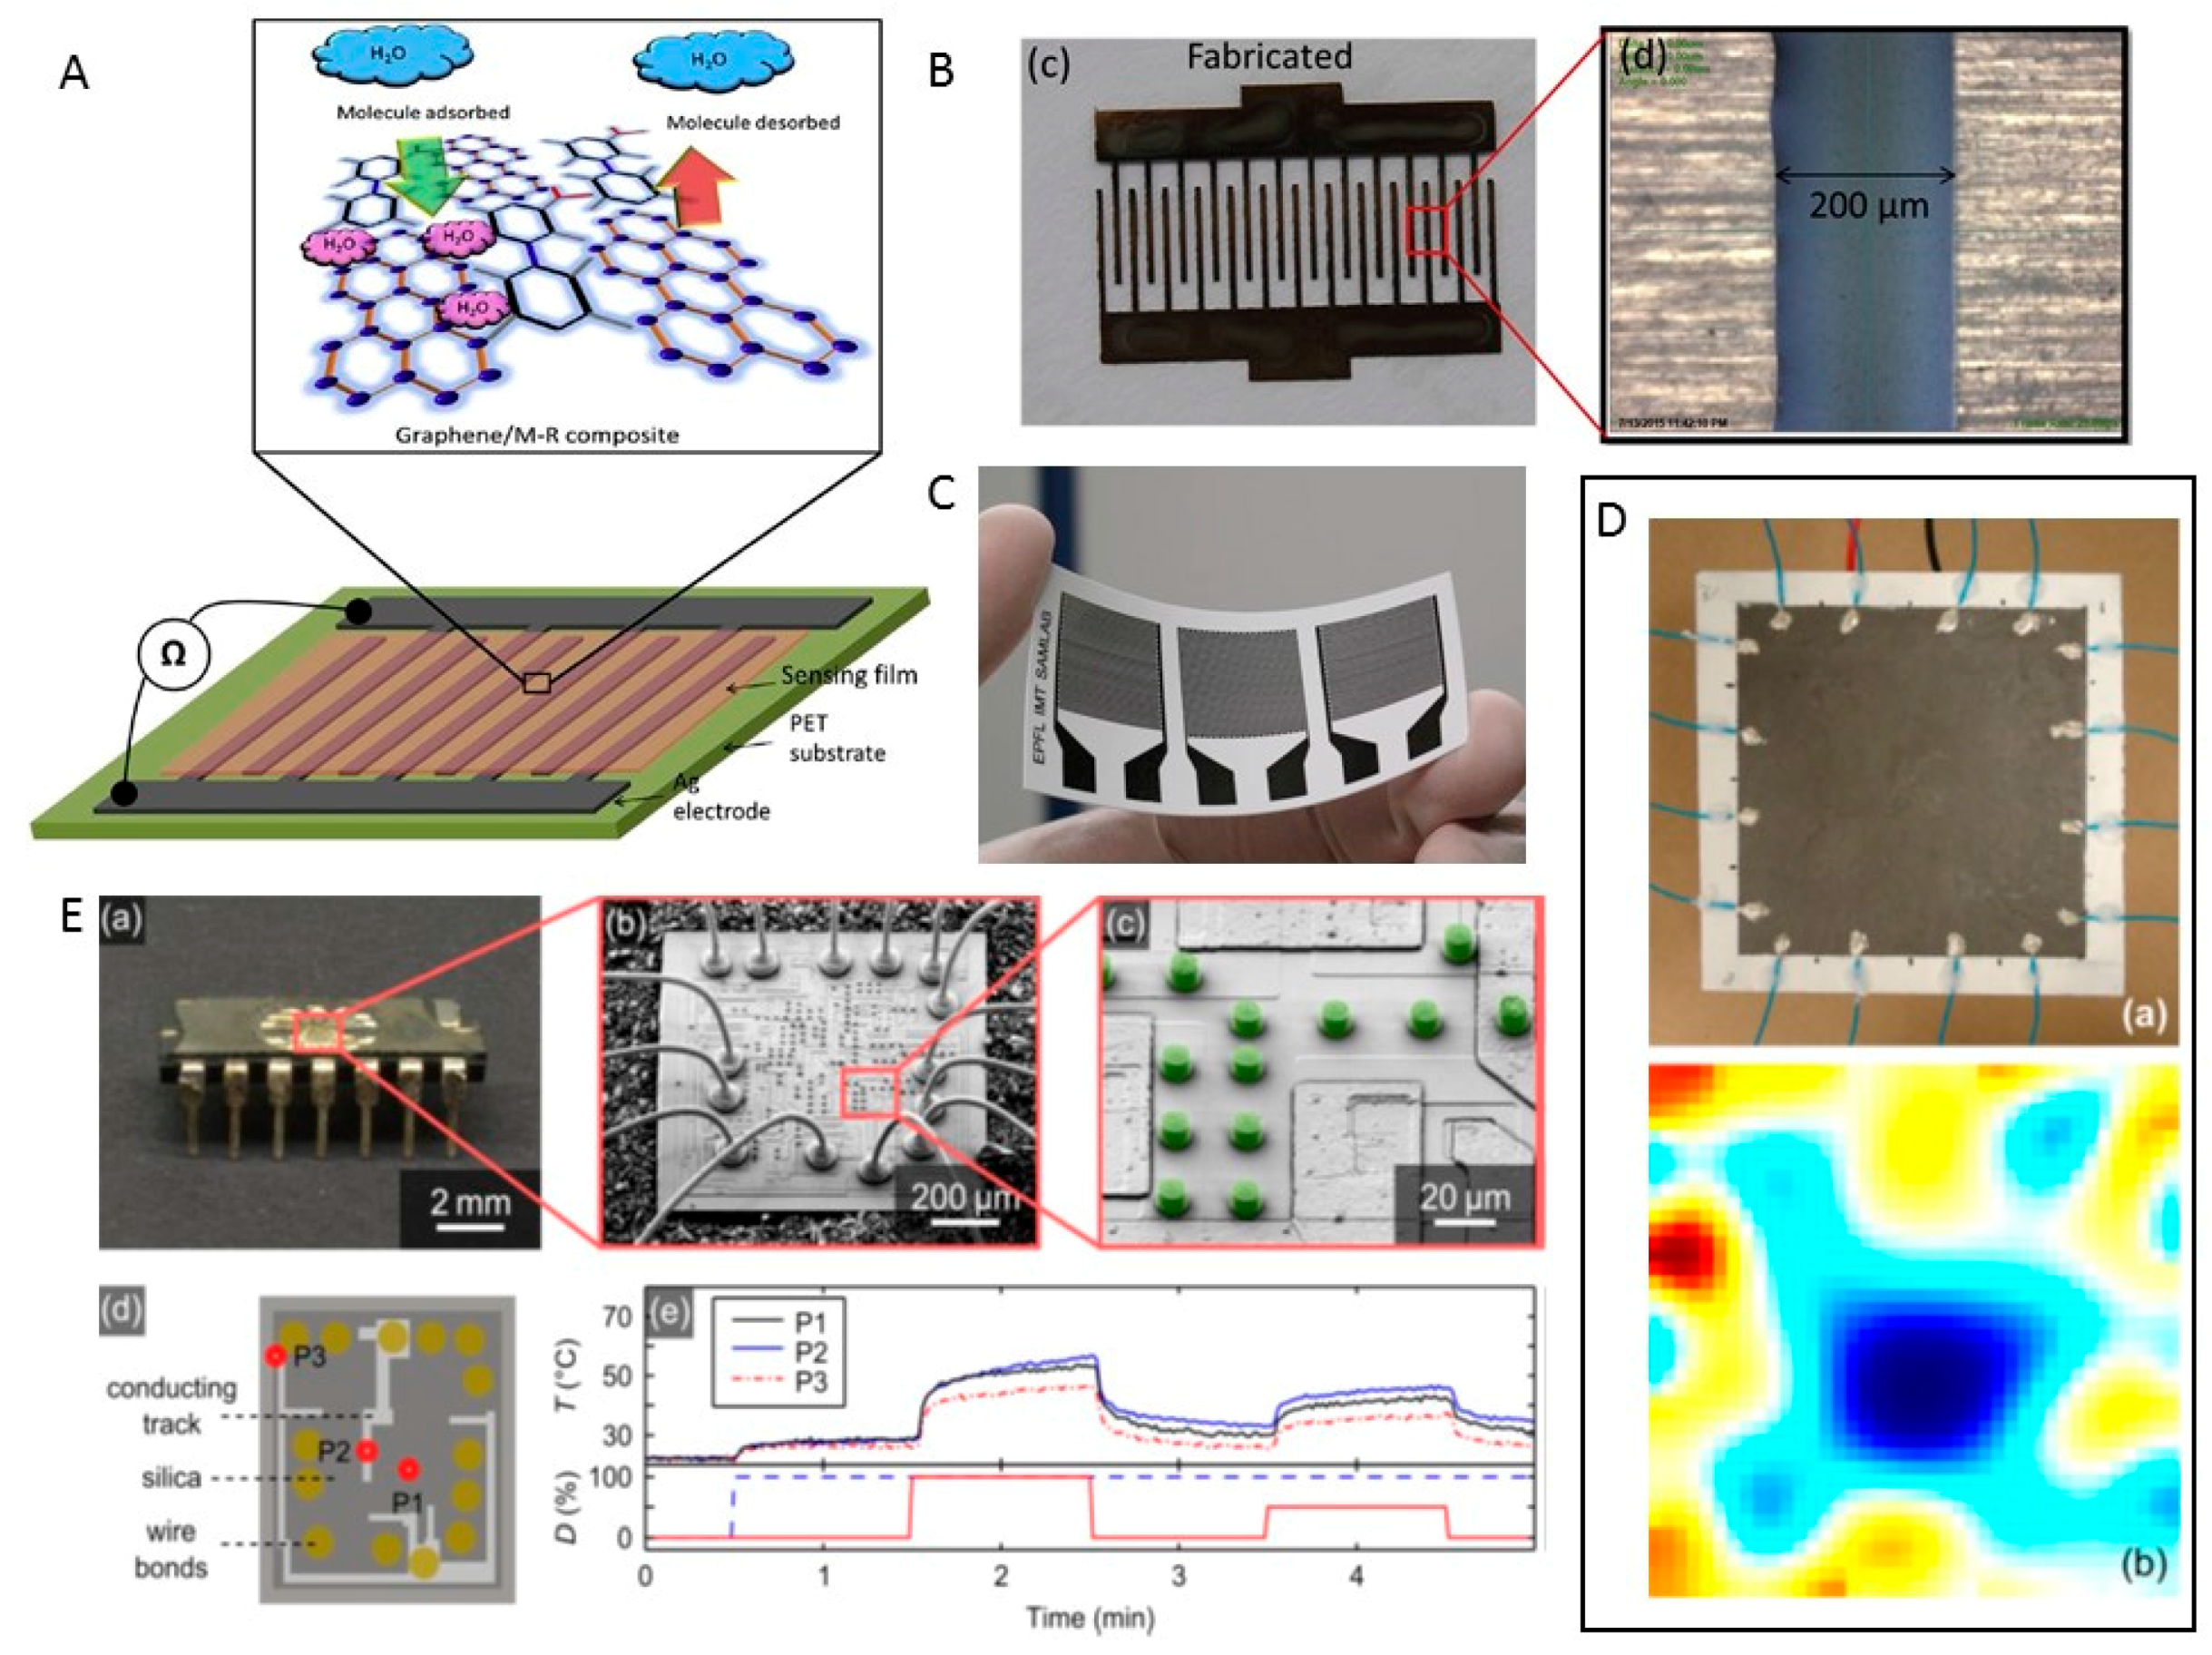 Sensors Free Full Text The Boom In 3d Printed Sensor Technology Printer Diagram System Detailed Block No